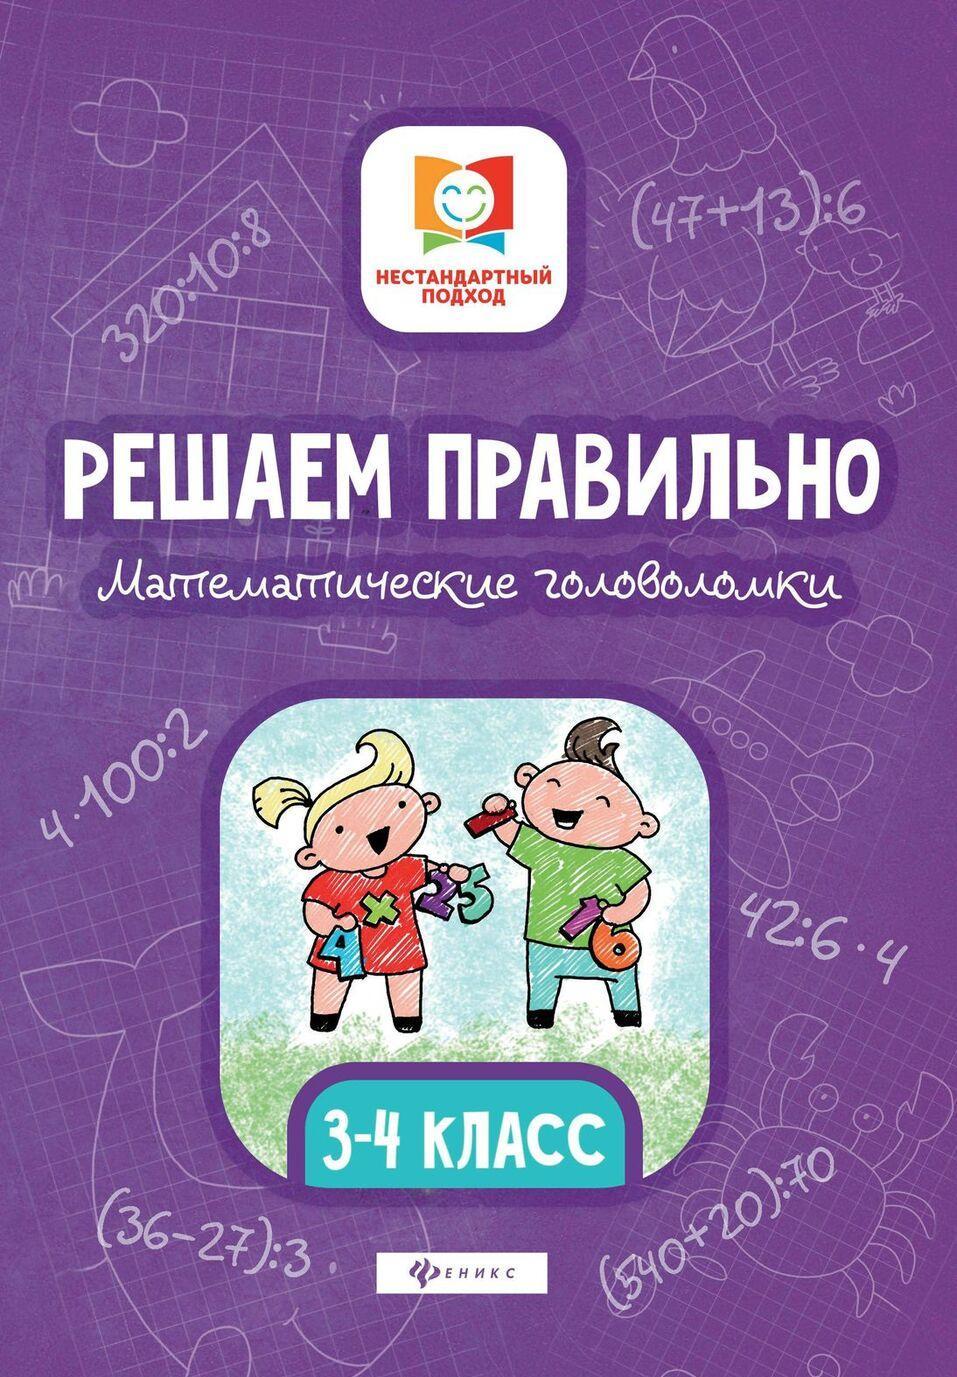 Reshaem pravilno. Matematicheskie golovolomki. 3-4 klass | Burjak Marija Viktorovna